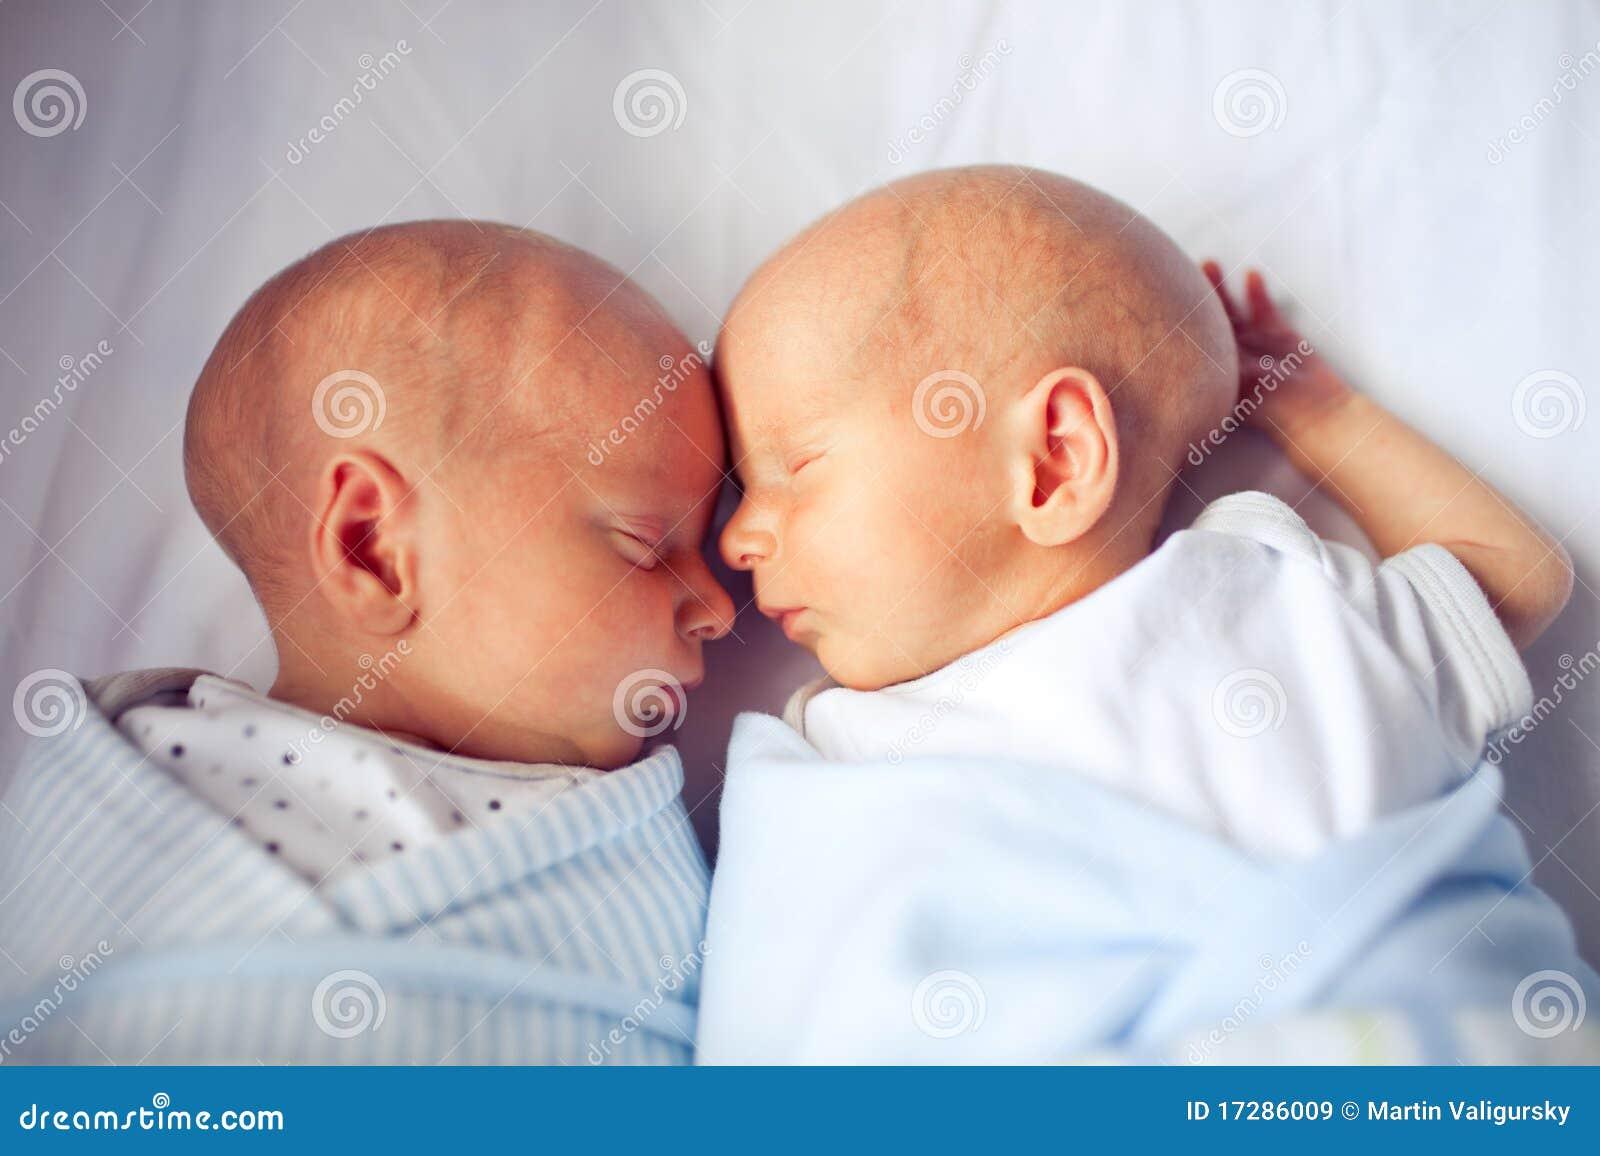 Cute Newborn Twins Sleeping And Bonding Royalty Free Stock ...